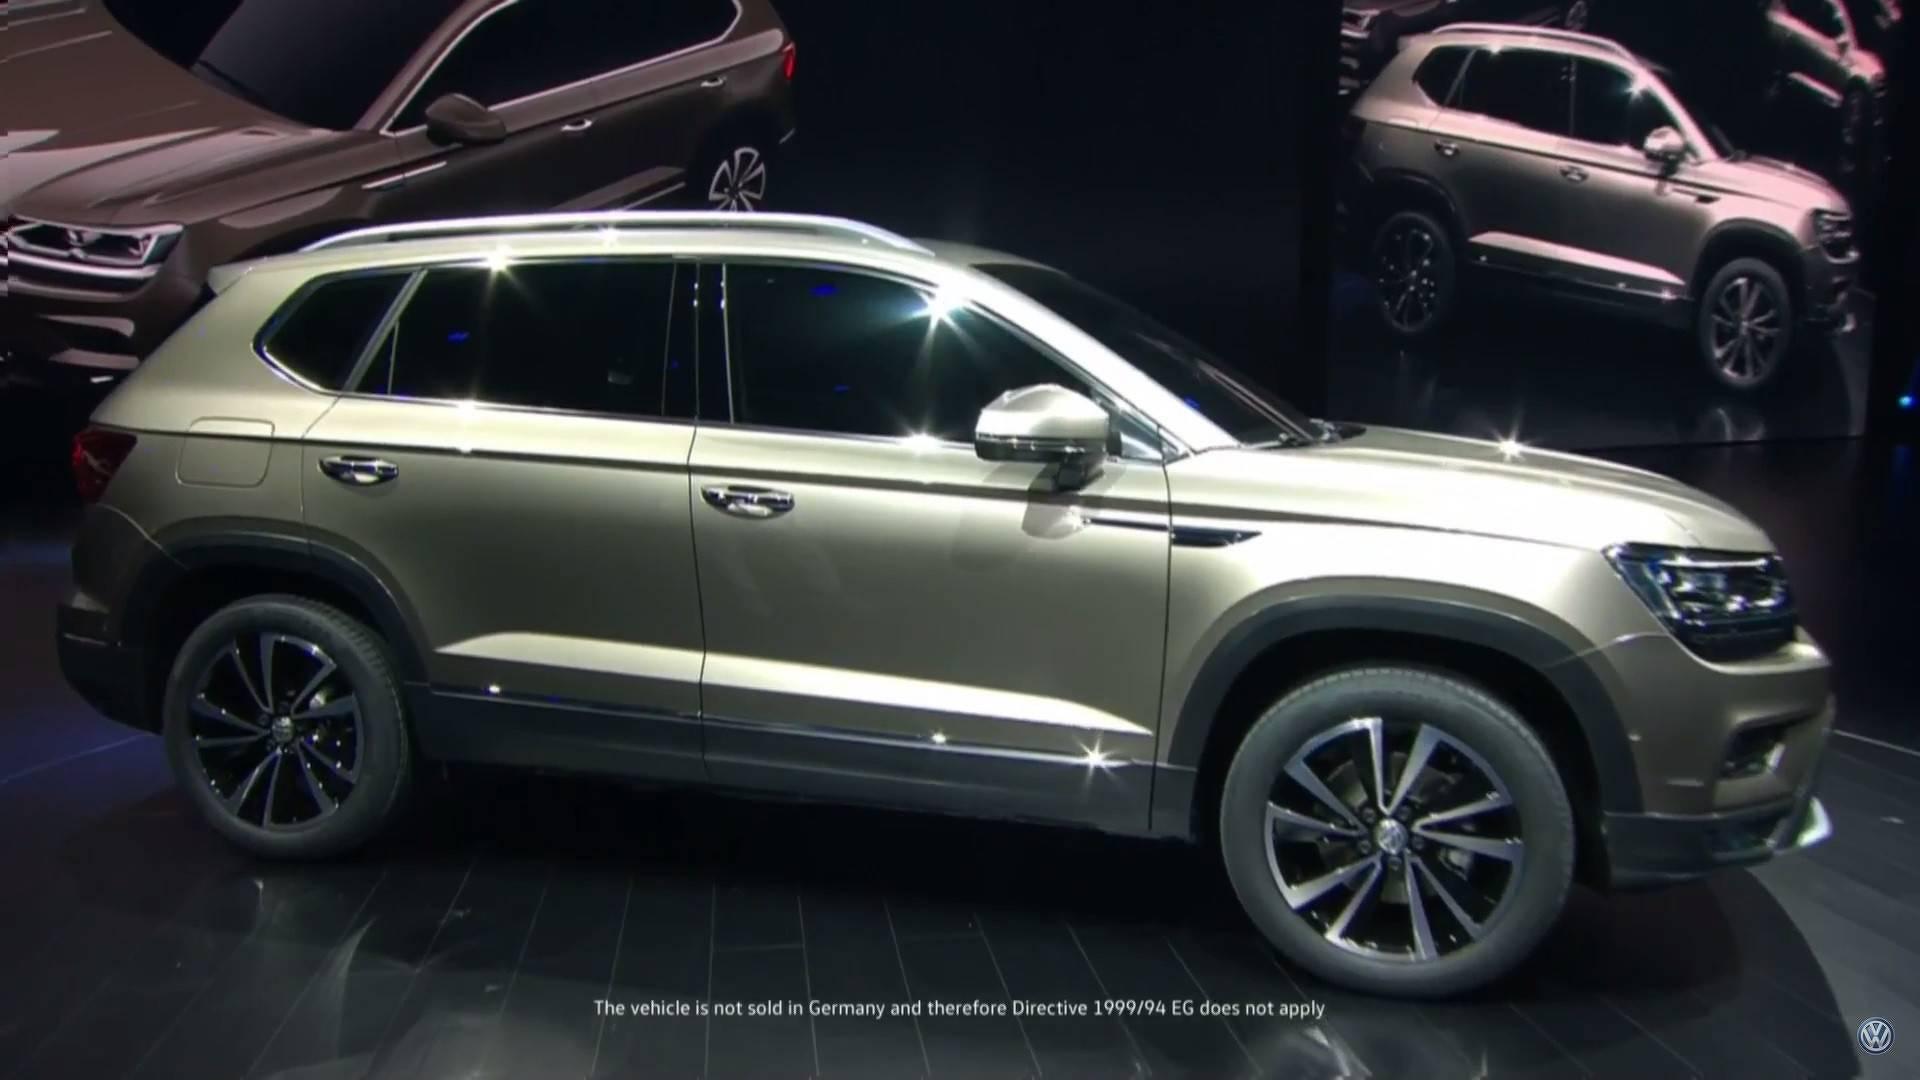 Volkswagen Taigo SUV spotted testing sans camouflage